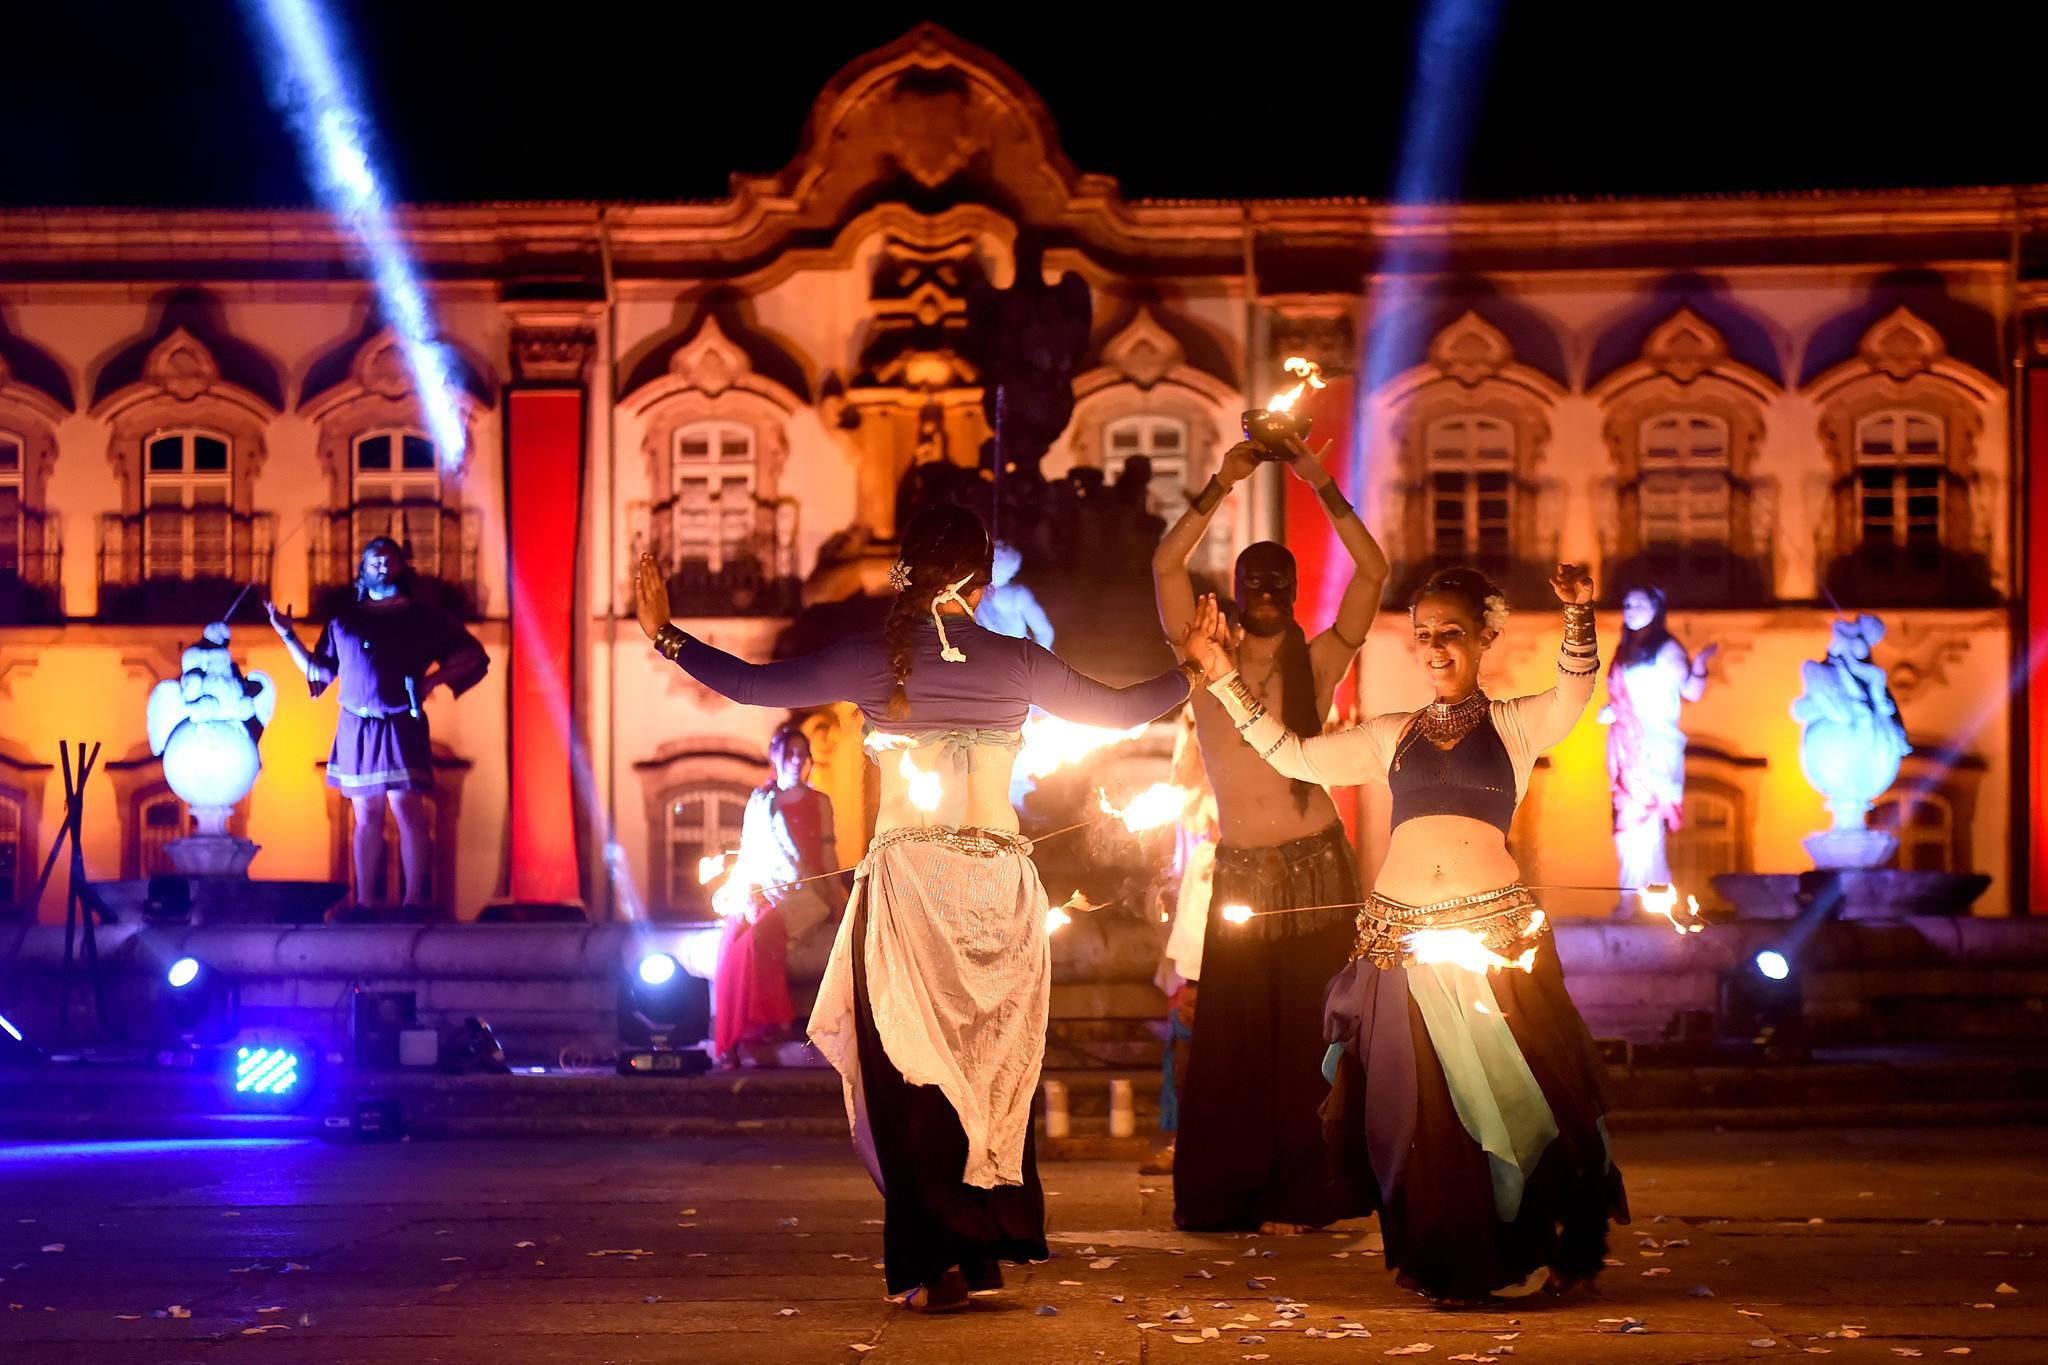 dança-fogo-braga-romana-2017-bracara-augusta